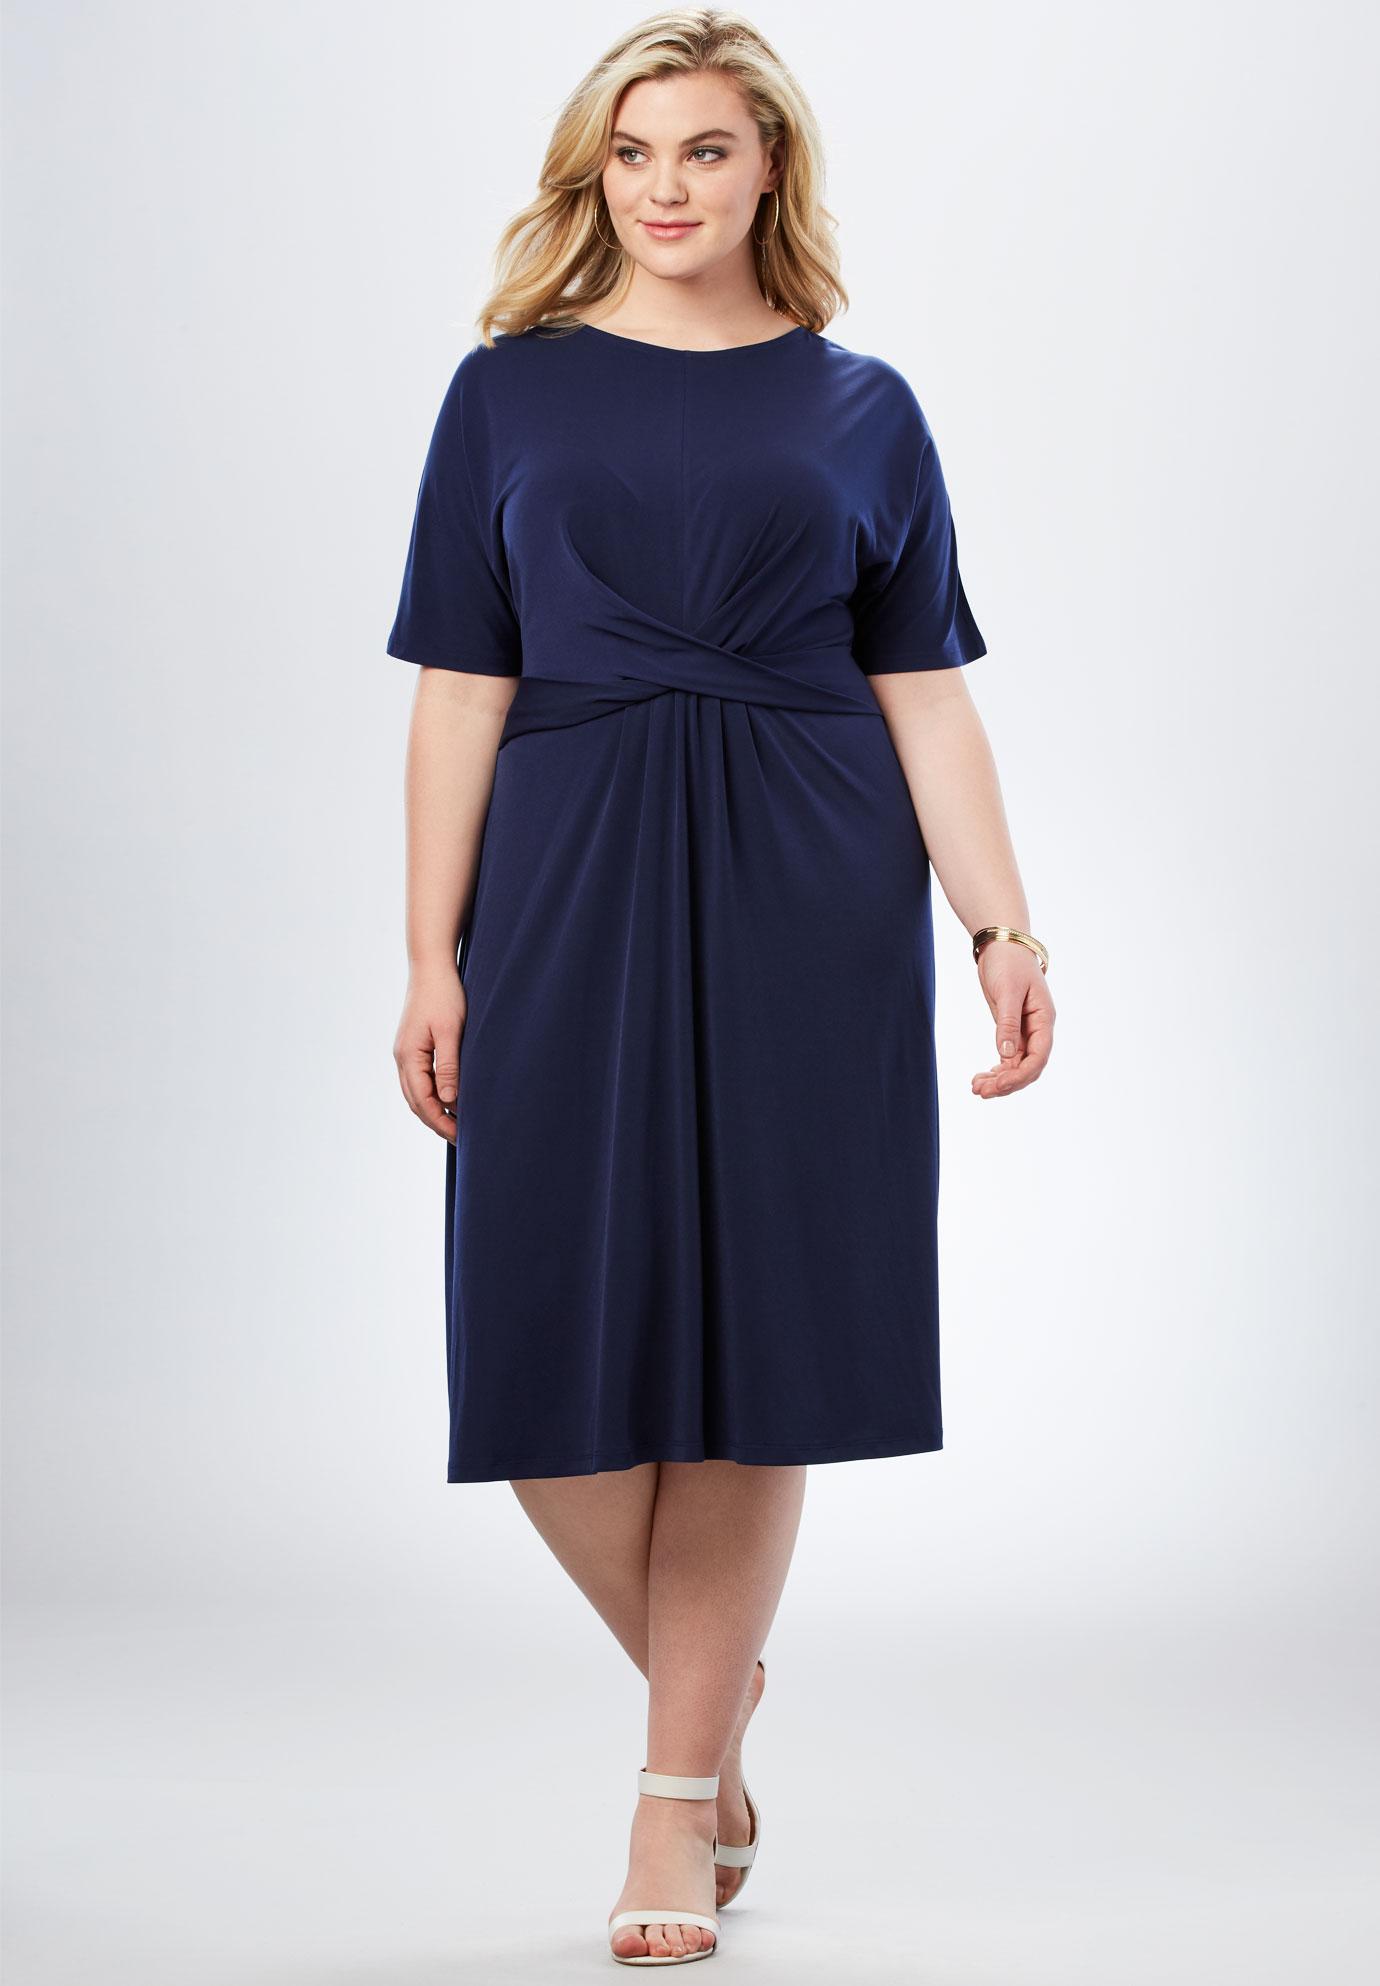 Twist Front Dress| Plus Size Work Dresses | Full Beauty